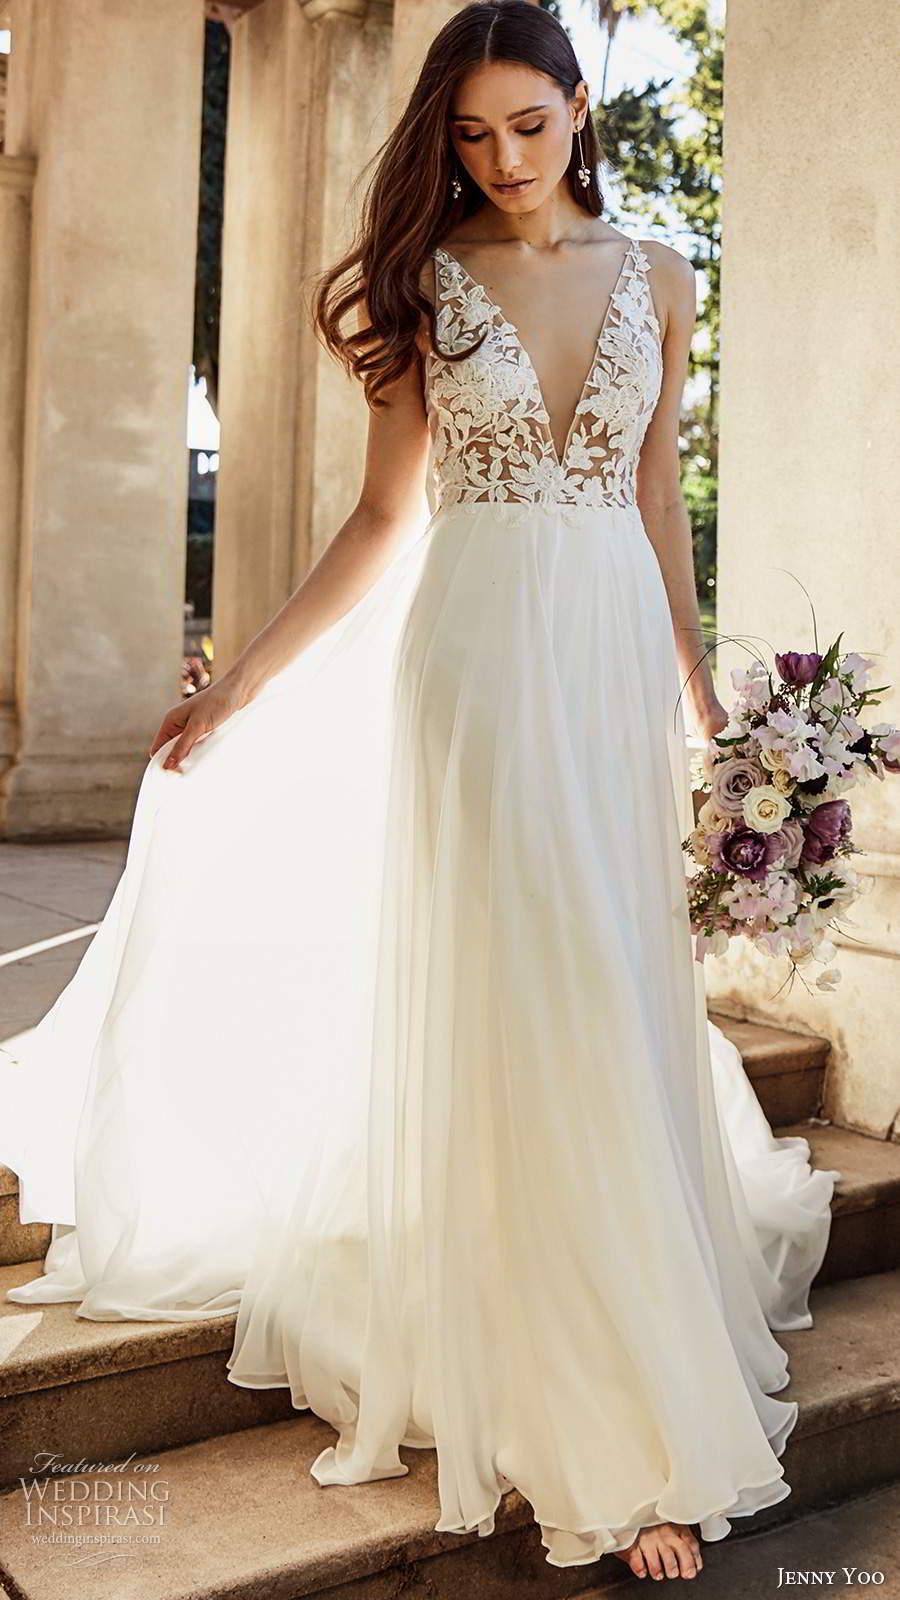 jenny yoo spring 2020 bridal sleeveless straps plunging v necklie embellished bodice clean skirt a line ball gown wedding dress chapel train (4) mv